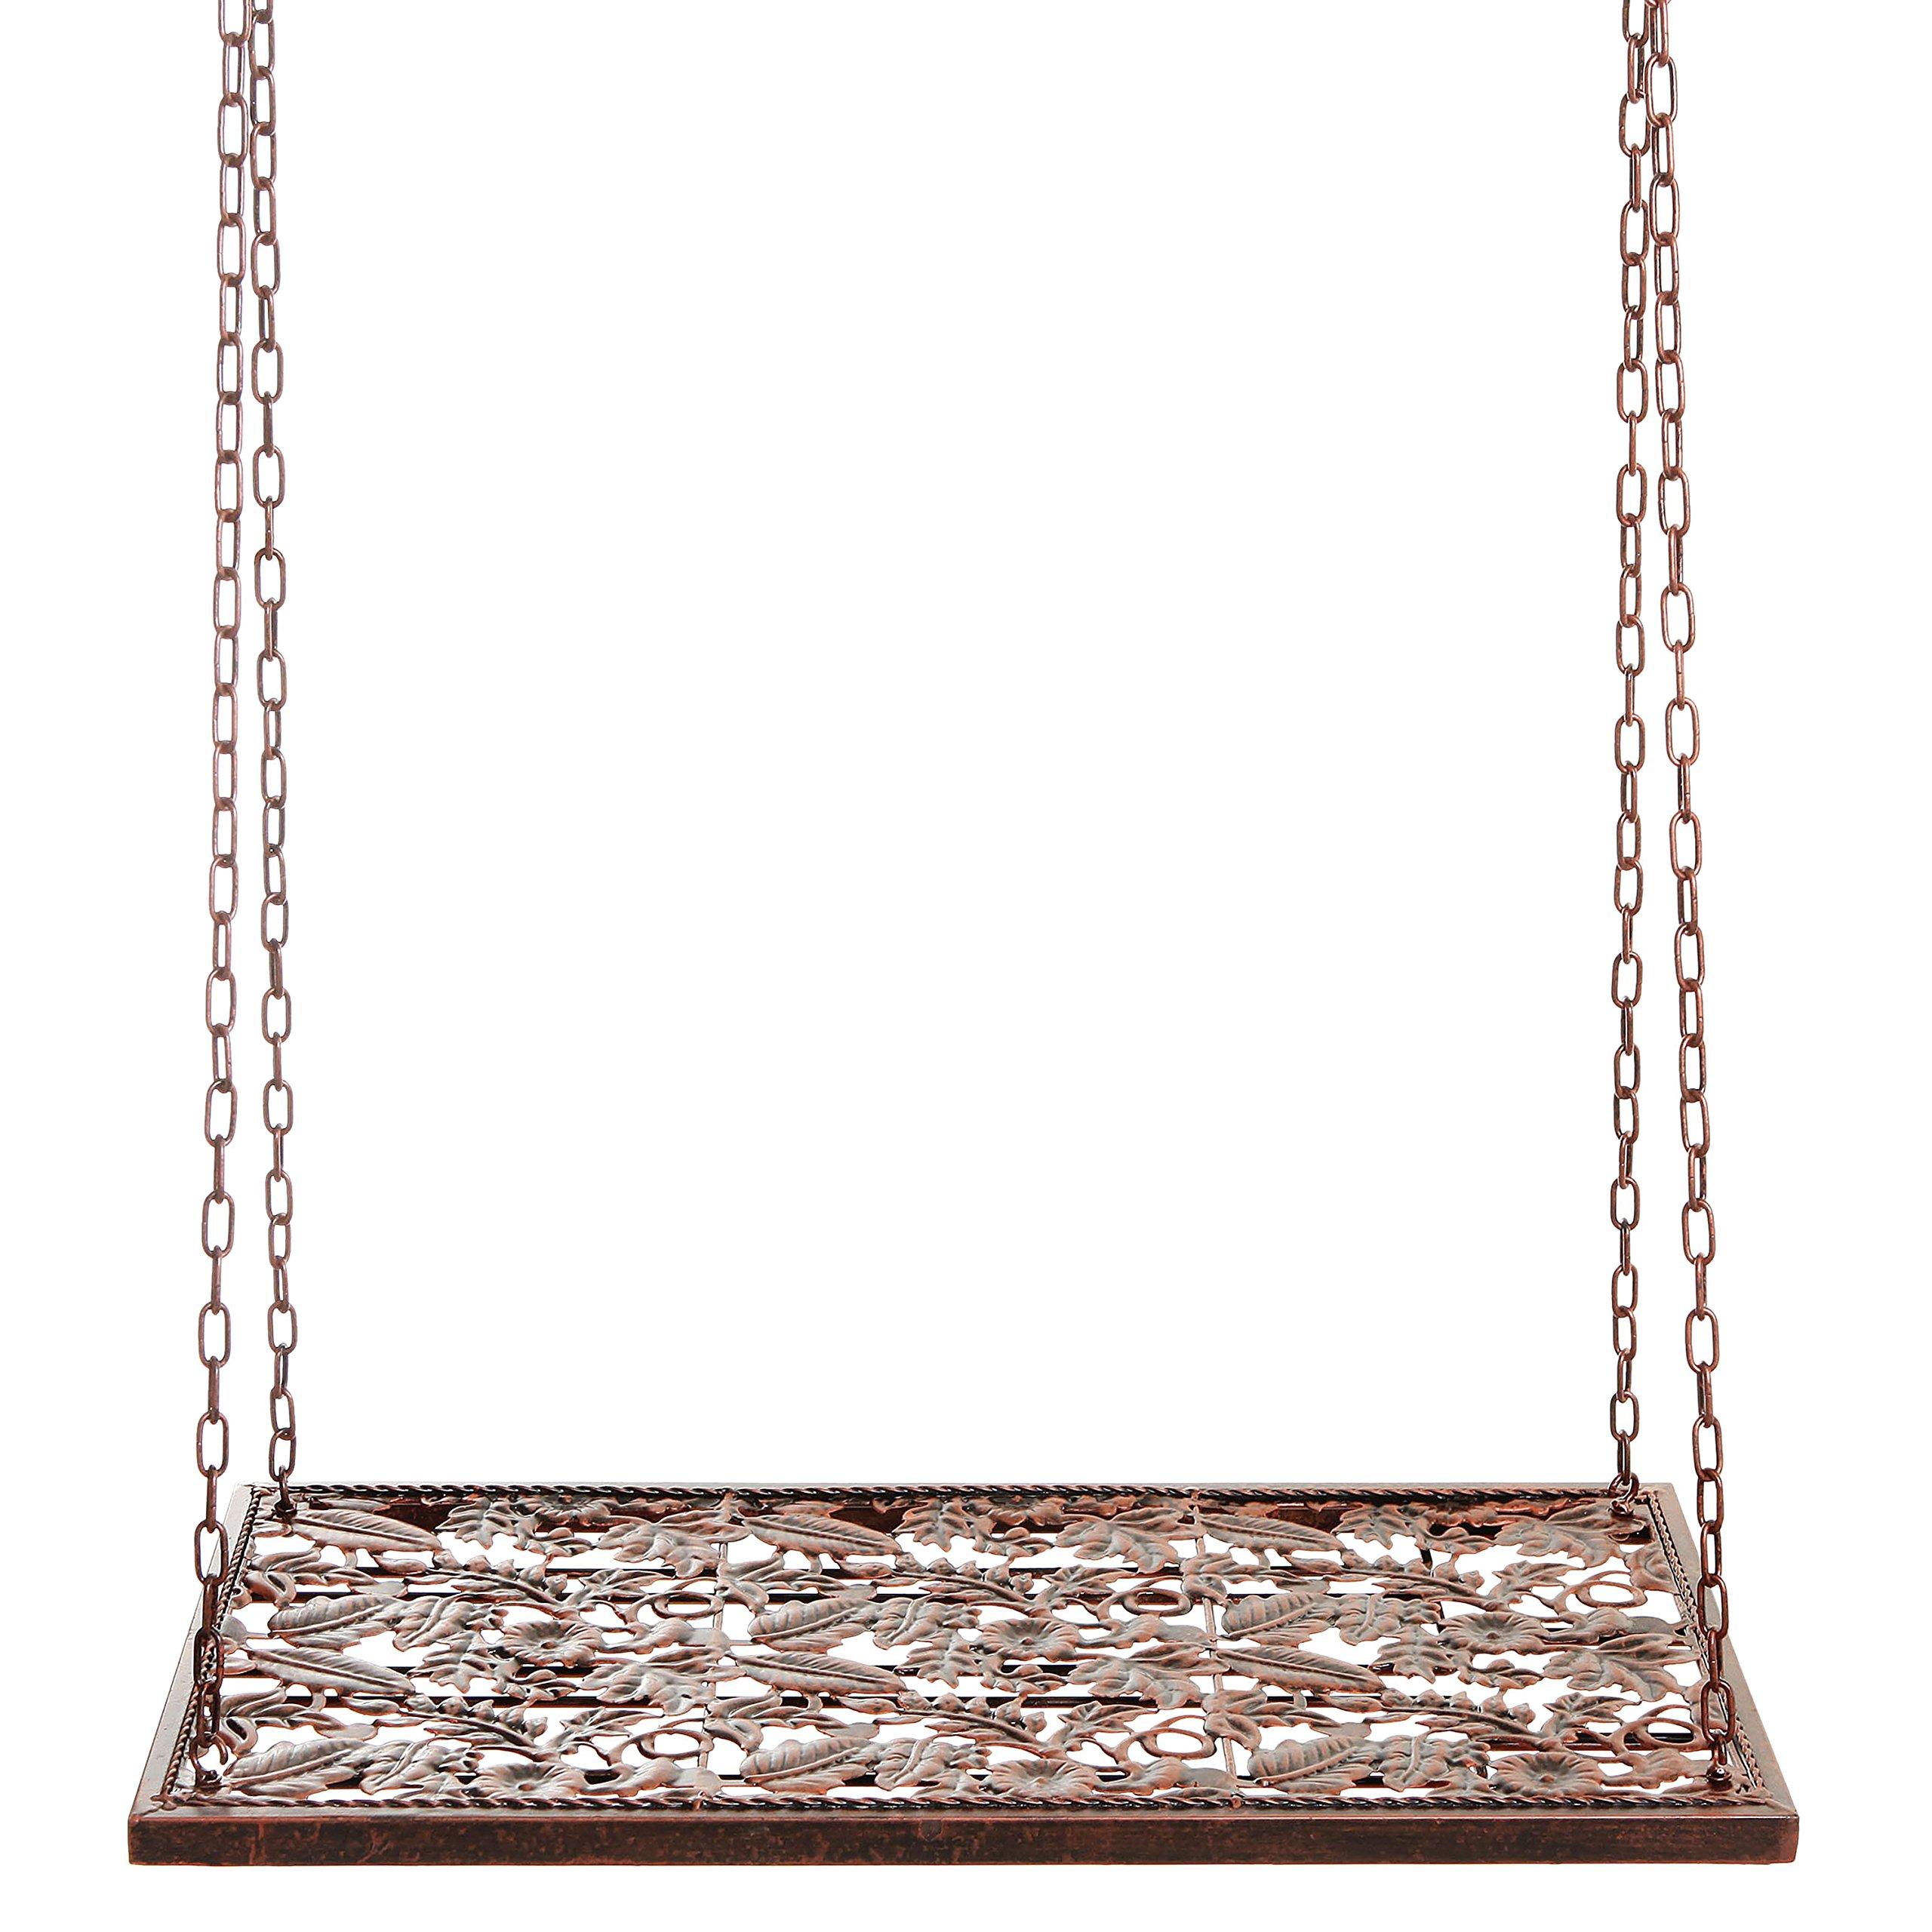 Vineyard Country Rustic Bronze Metal Ceiling Mounted Hanging Stemware Wine Glass Hanger Organizer Rack by MyGift (Image #5)